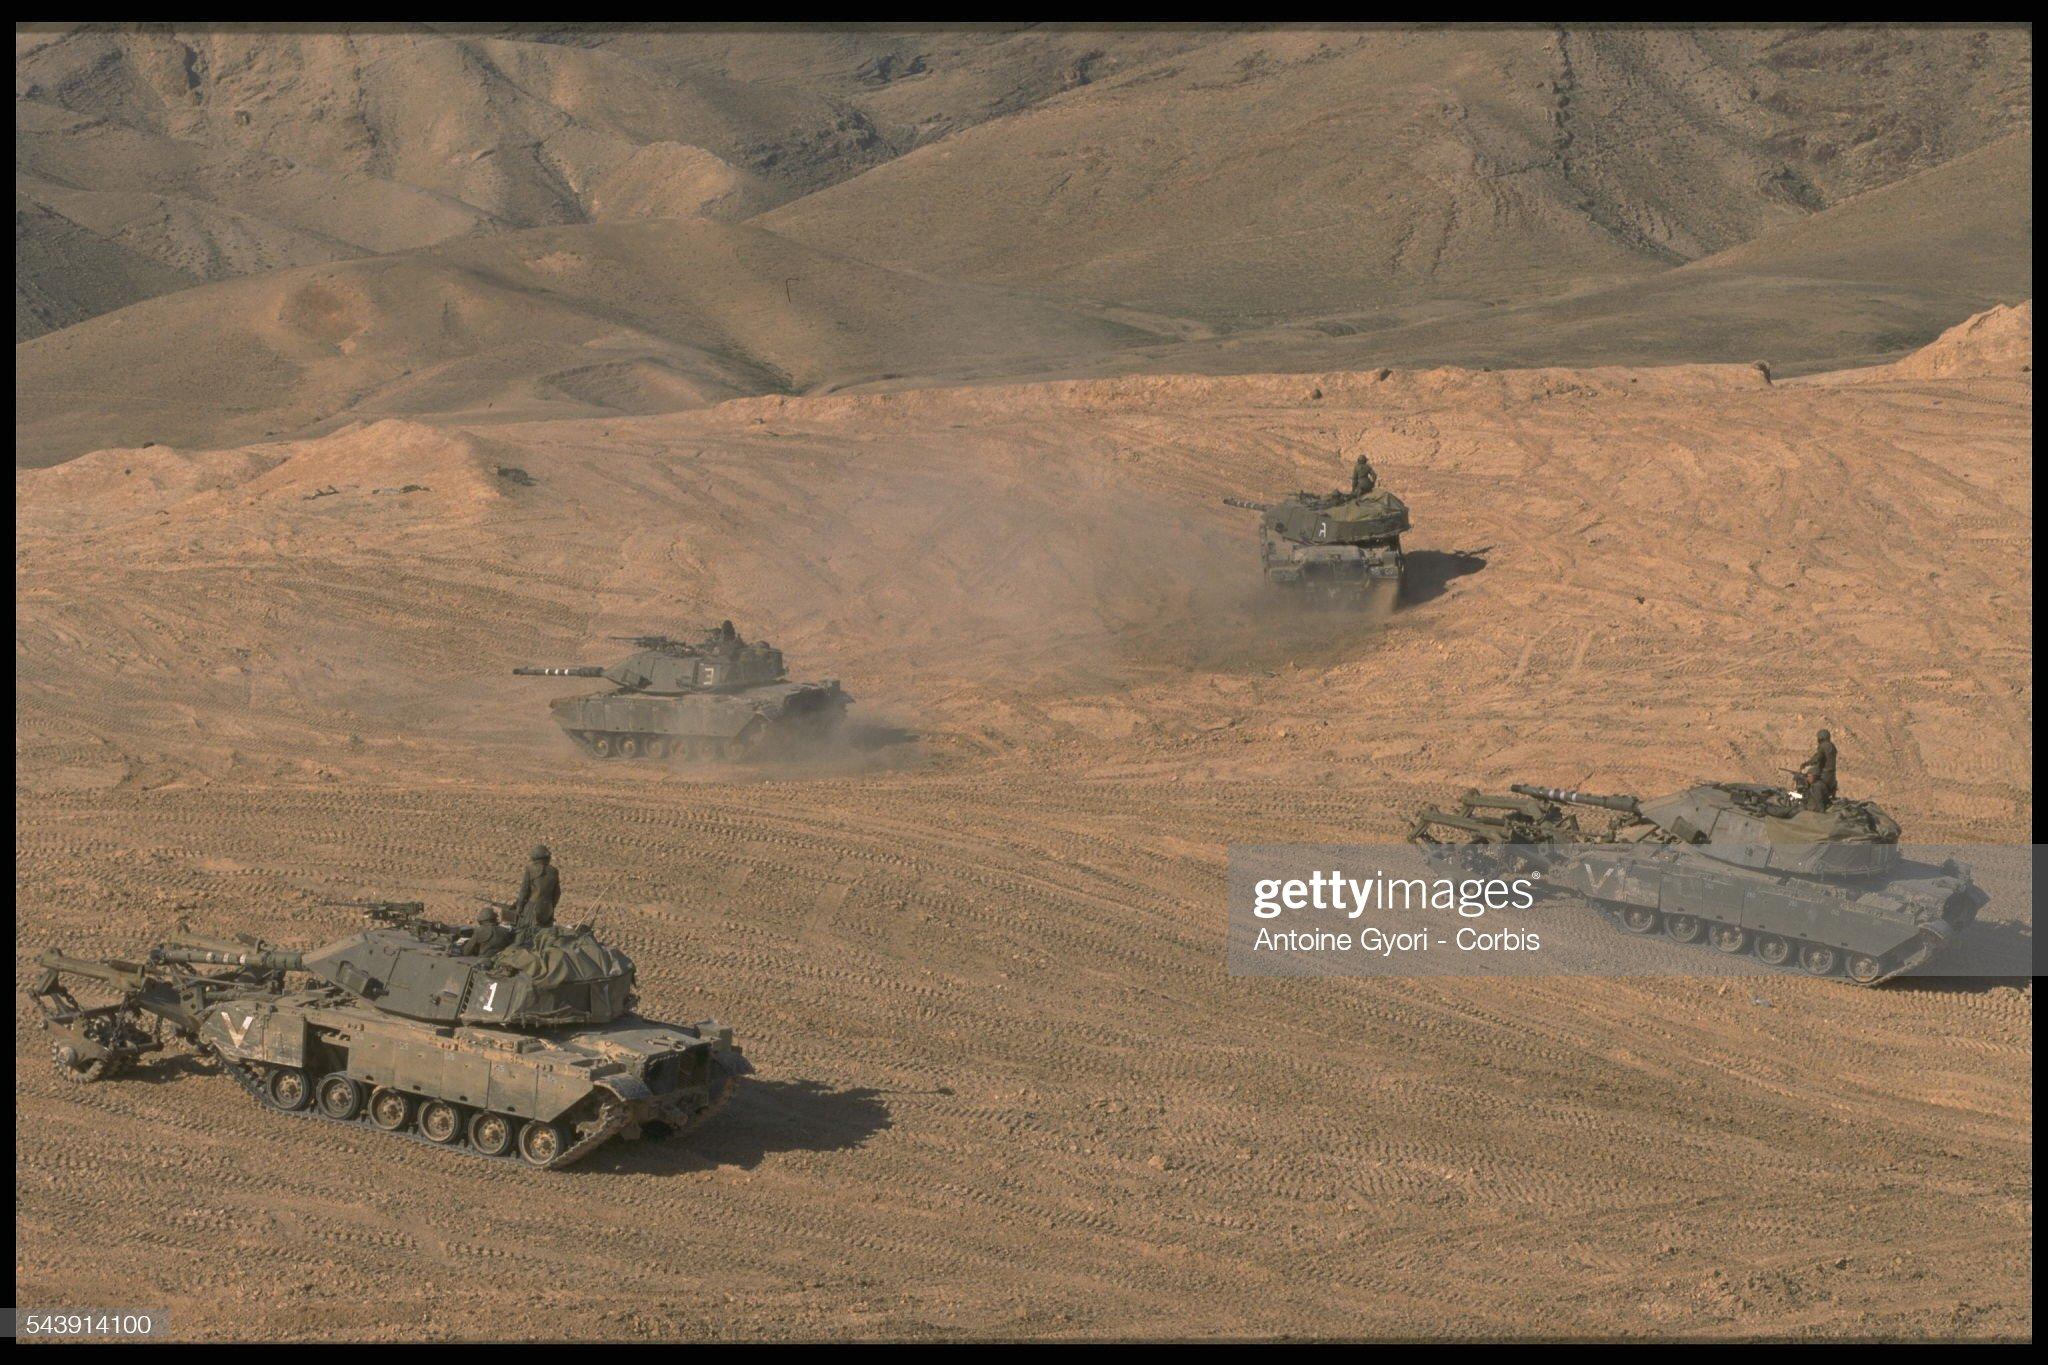 https://media.gettyimages.com/photos/merkava-tanks-picture-id543914100?s=2048x2048